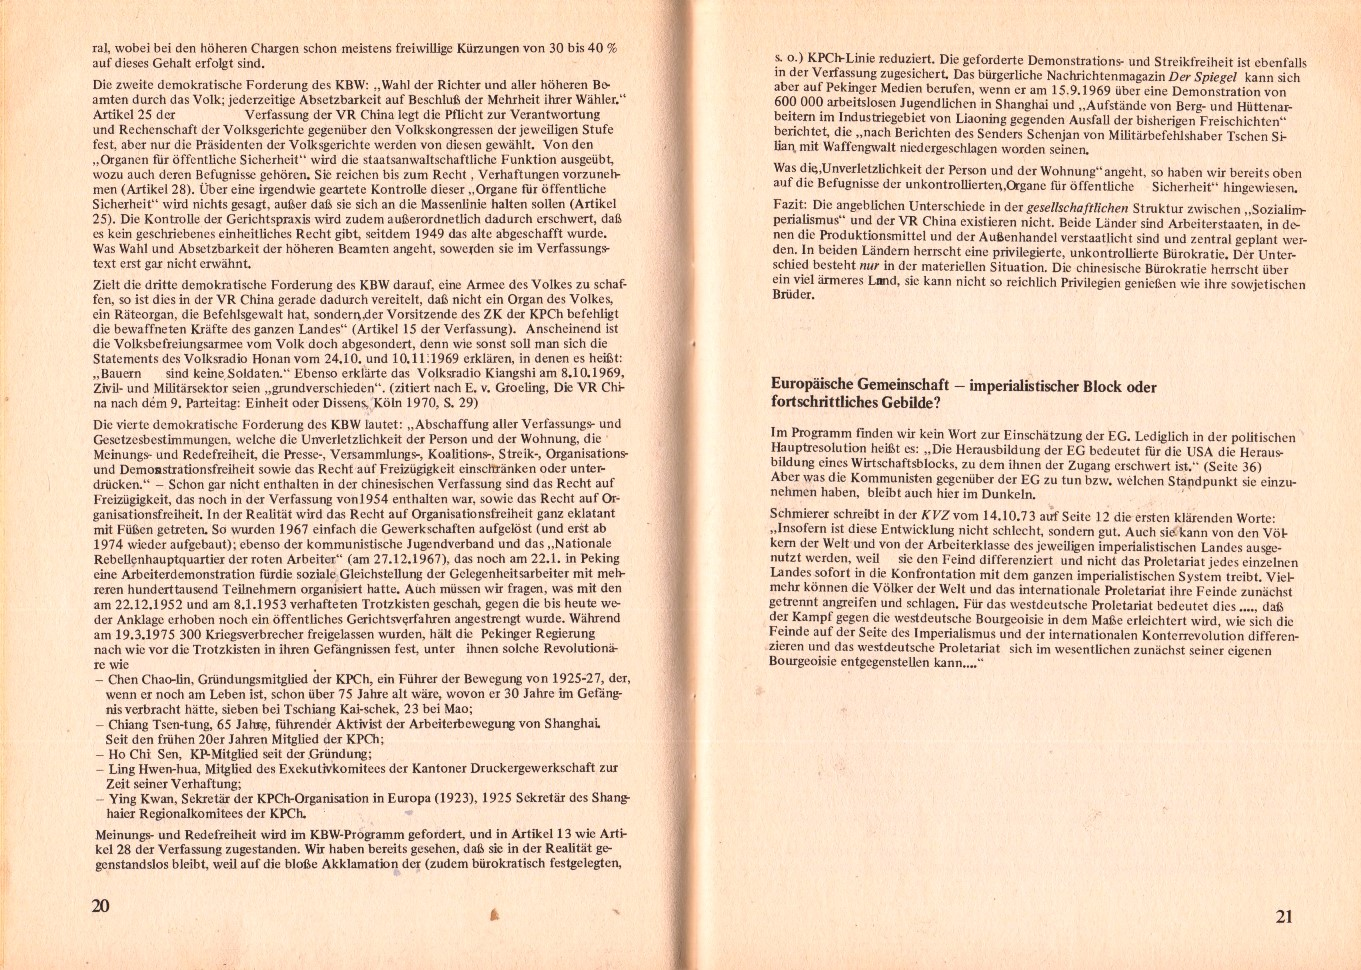 Spartacus_1975_Kritik_des_KBW_12